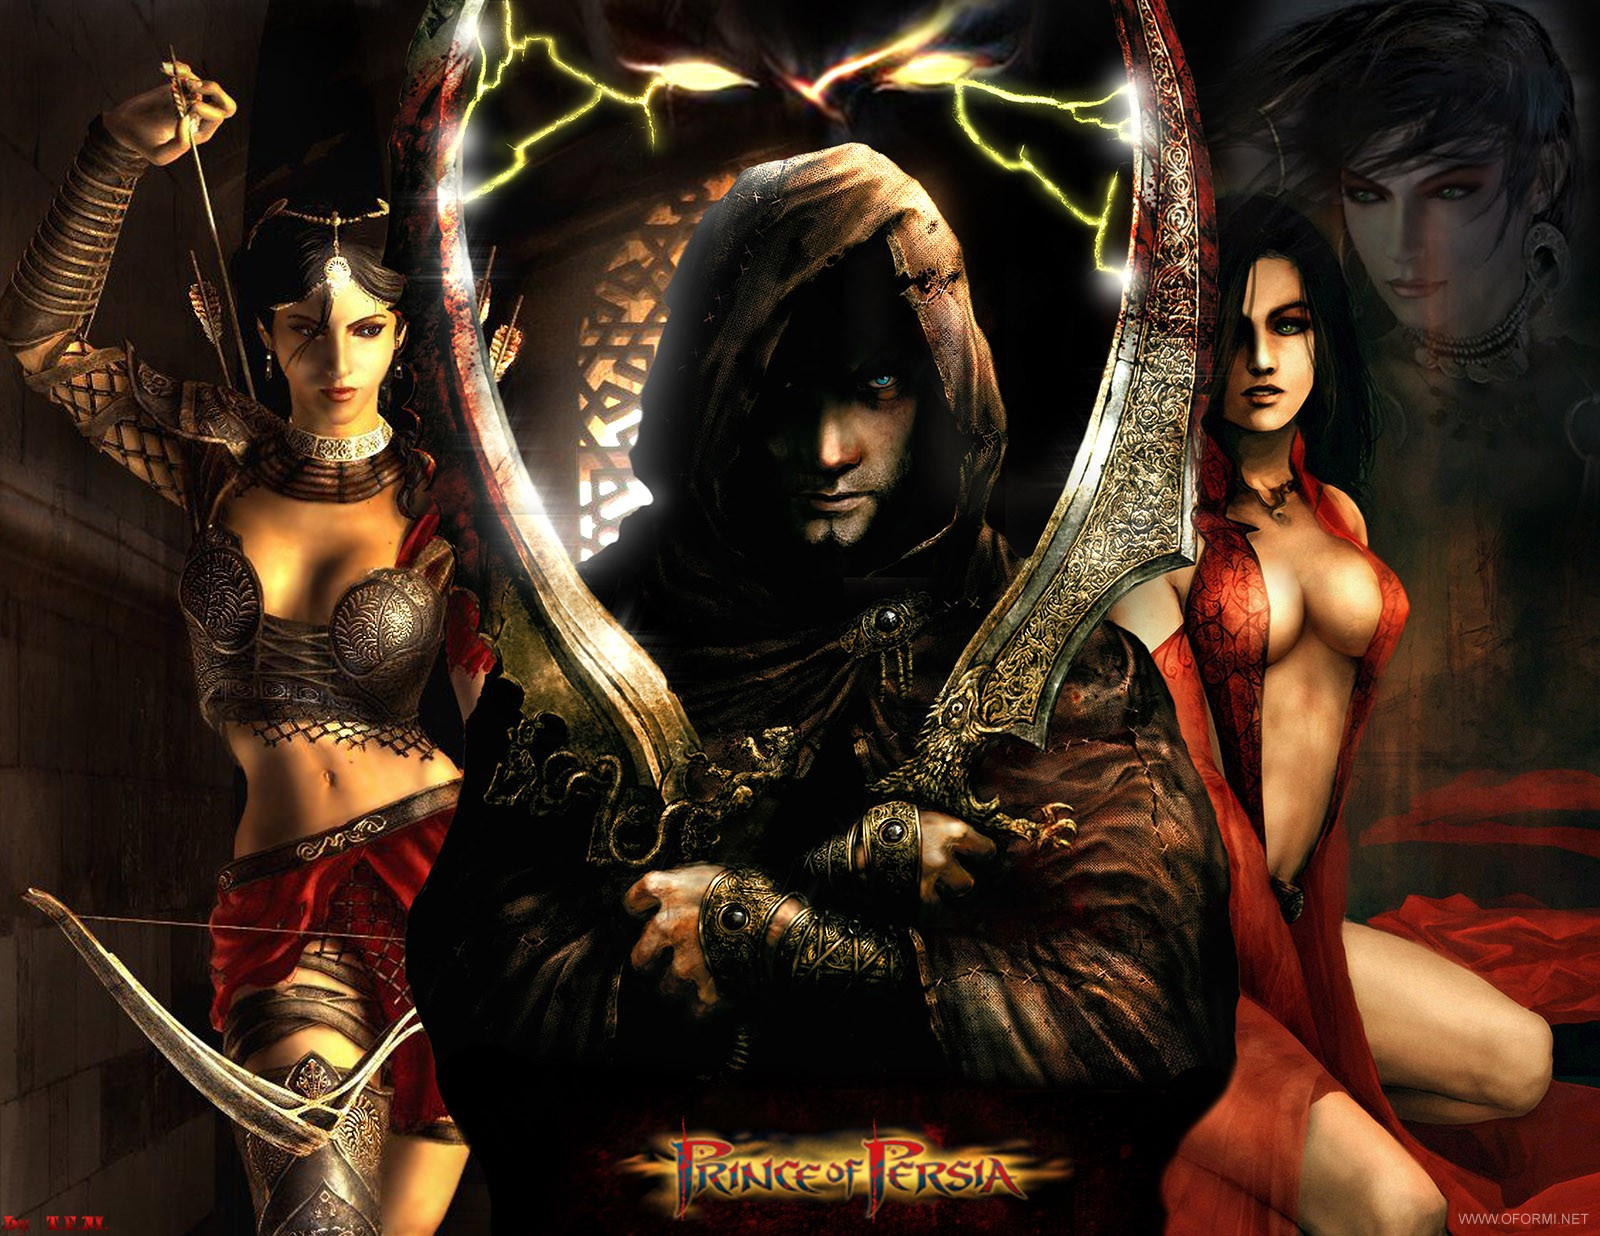 Prince of persia warrior within kaliena sex  nude tube